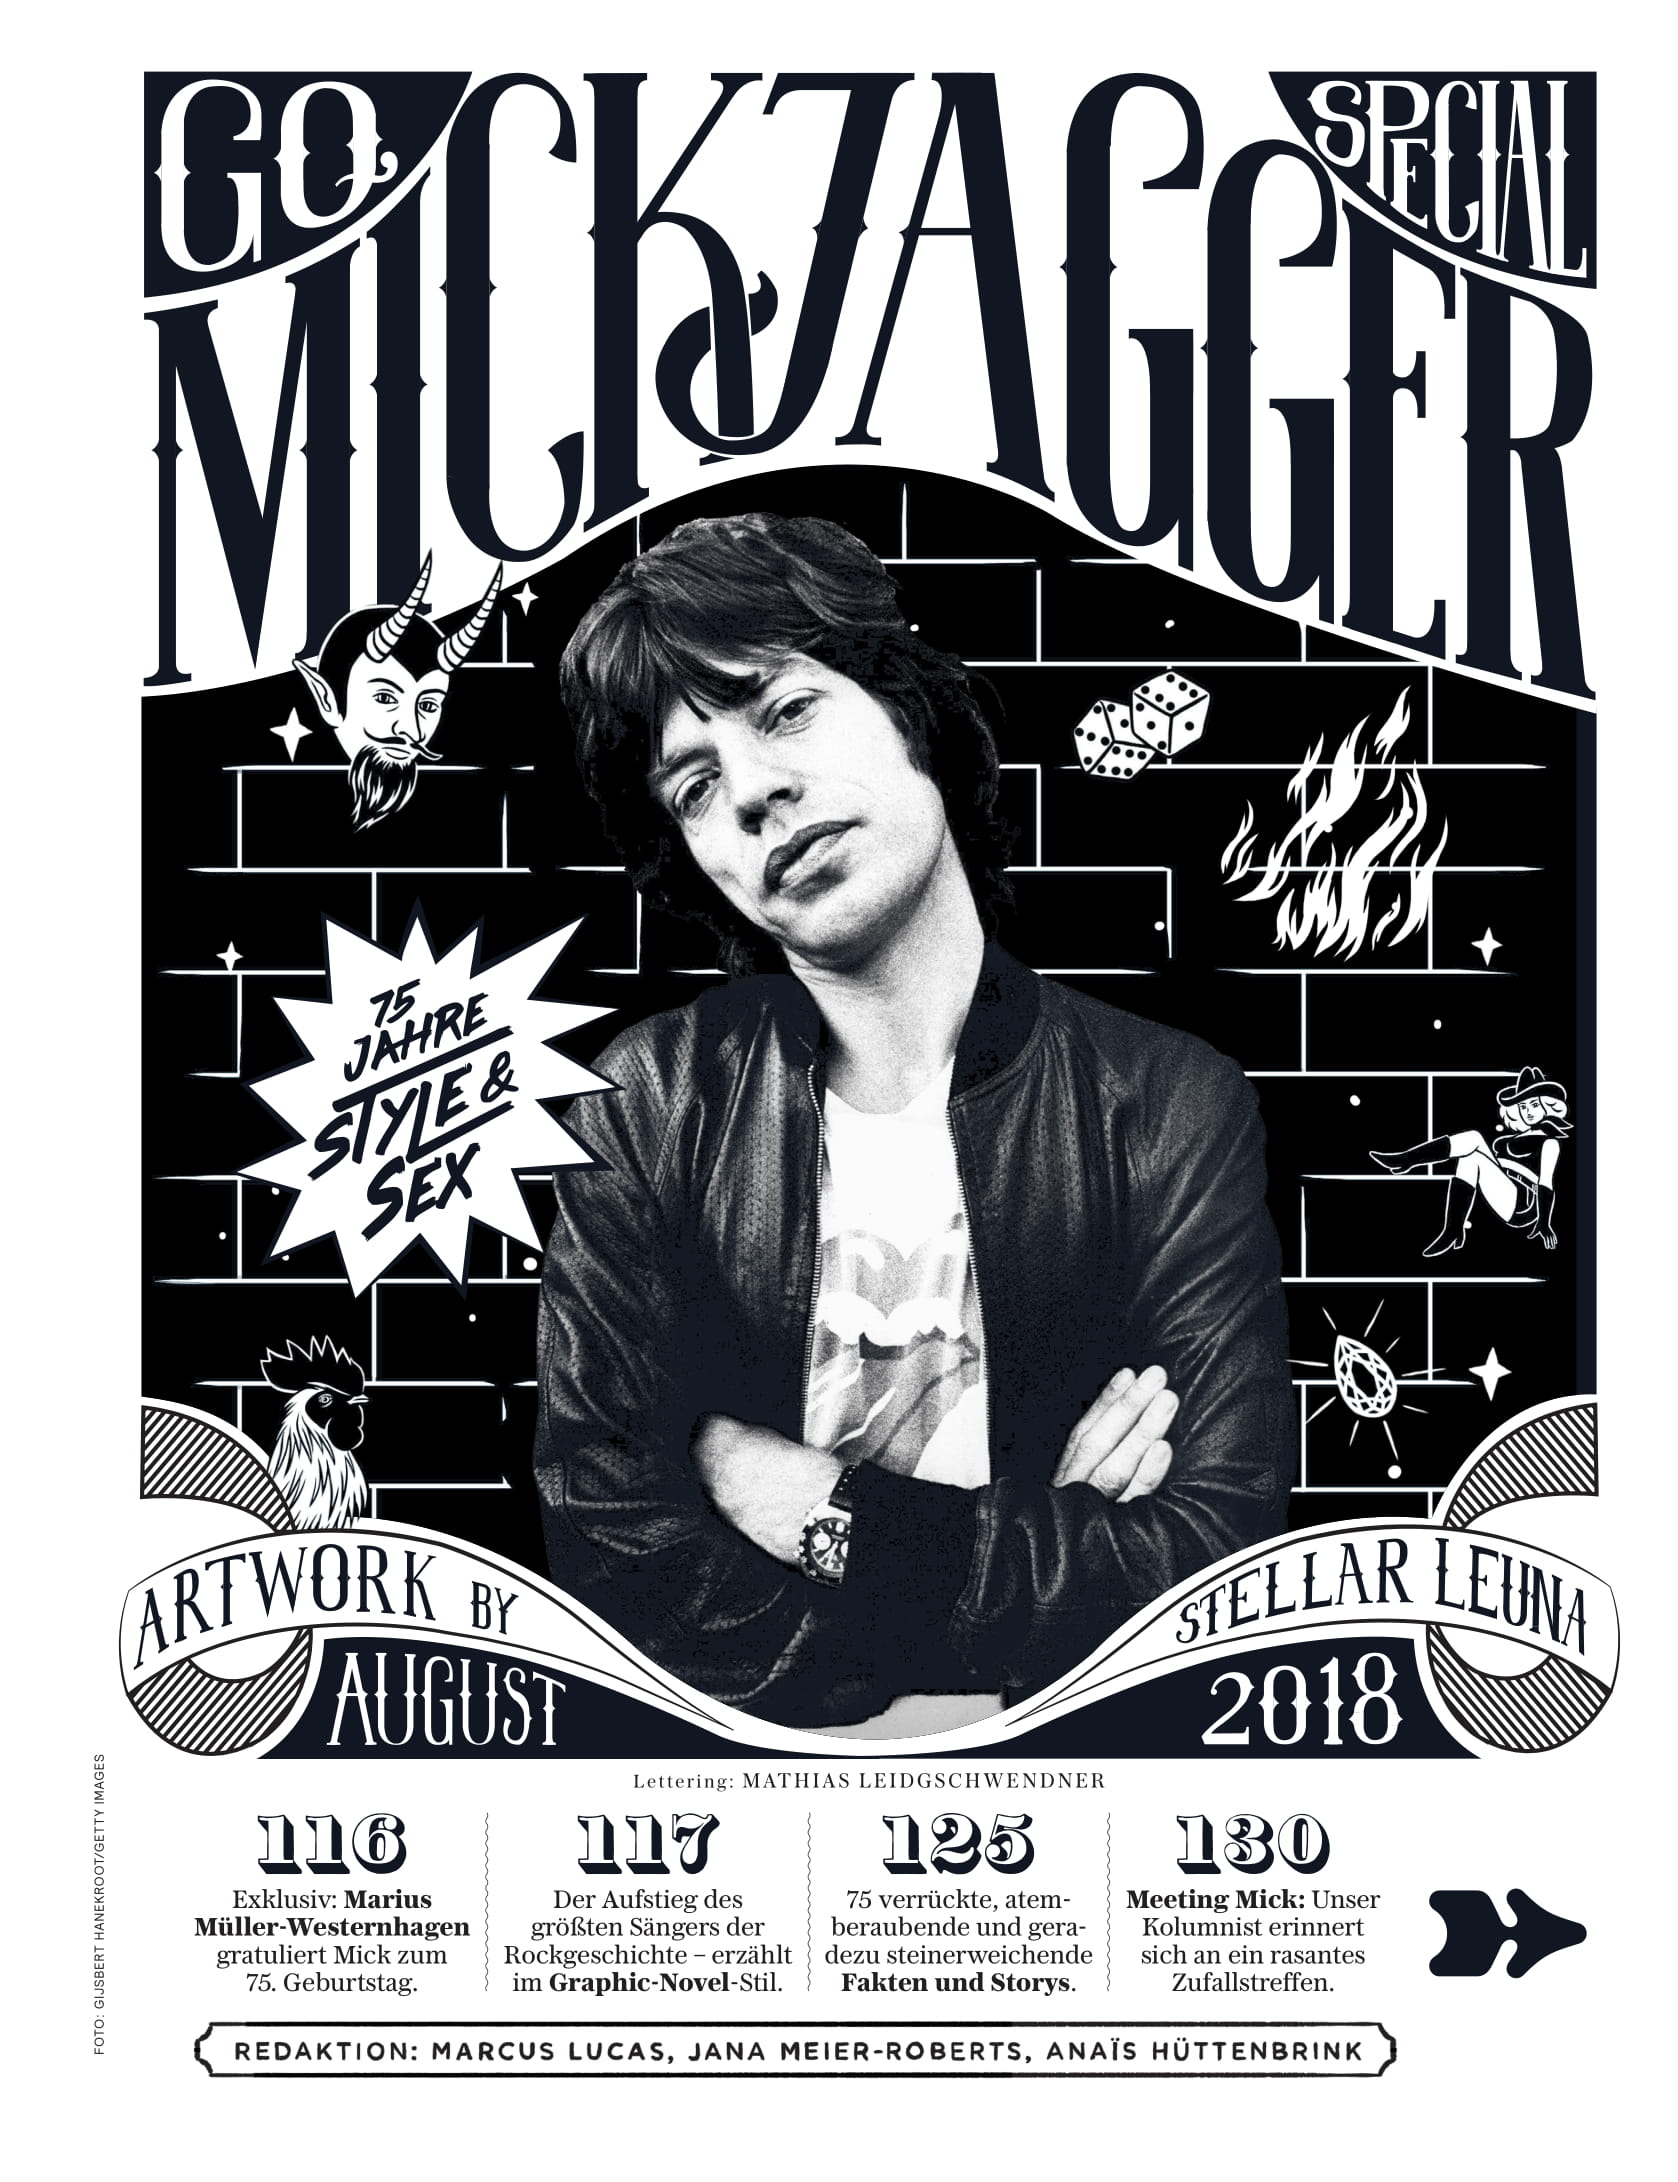 mickjagger_comic-1.jpg